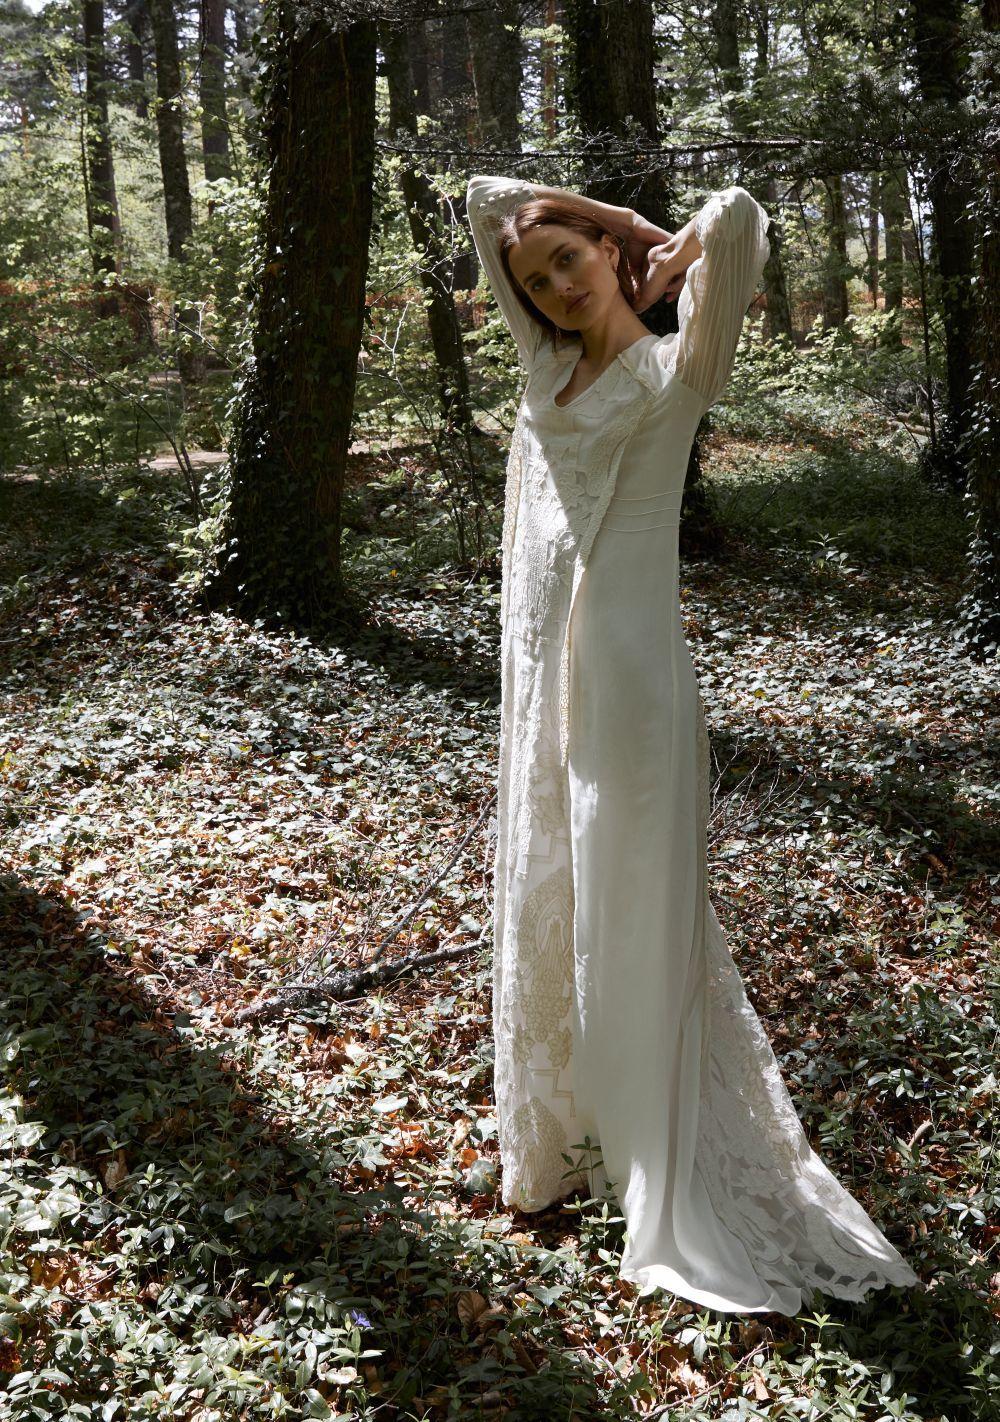 Vestido <em>Verona</em> bordado con jaretas en las mangas, de Alejandra Valero.